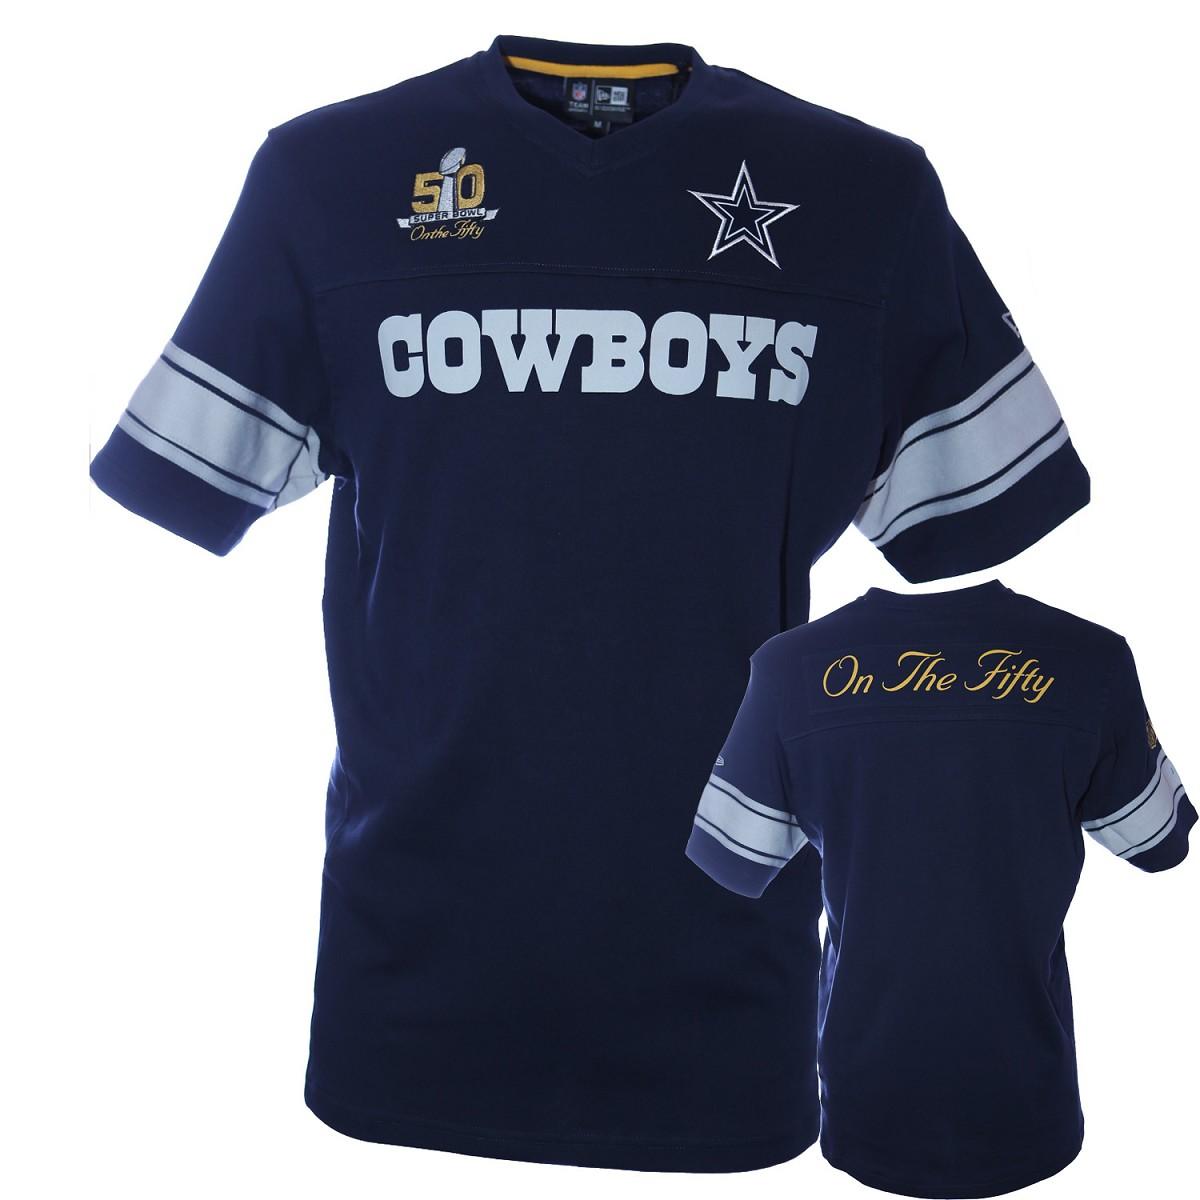 Jersey Nfl New Era Sb50 Af Dallas Cowboys Jerseys Apparel